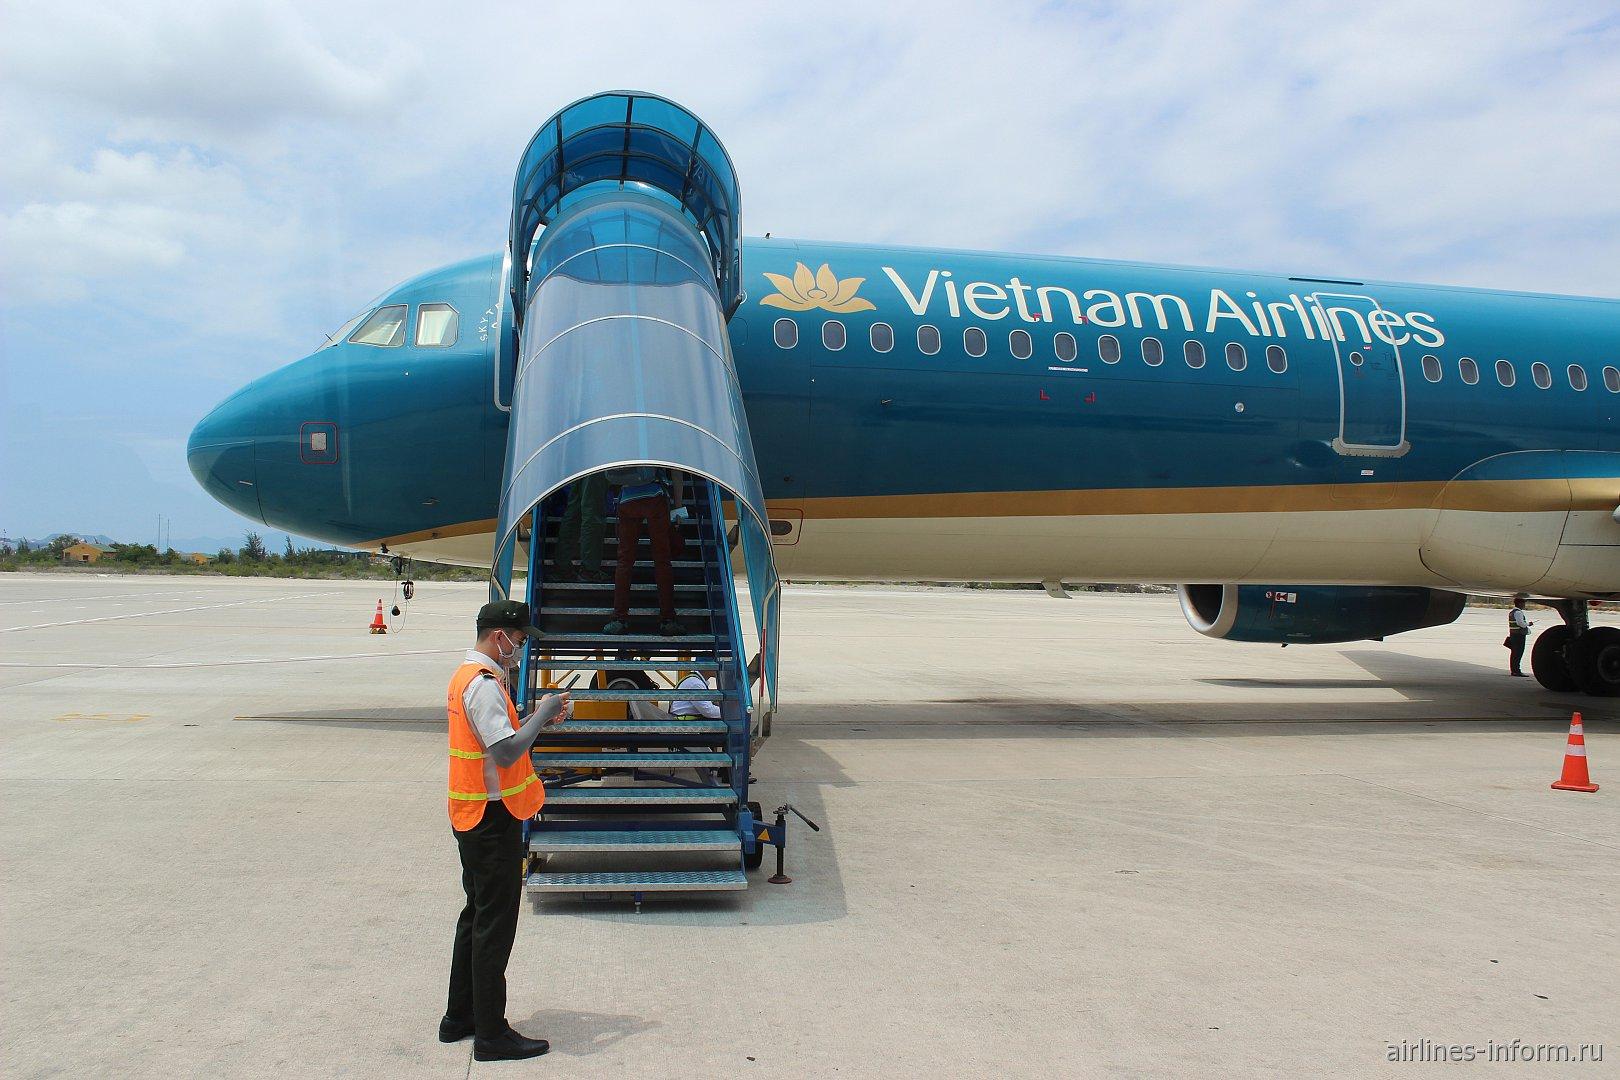 В гости к вьетнамцам. Часть 4. Nha Trang (Cam Ranx, CXR) - Ho Chi Minh City/Saigon (Tan Son Nhat, SGN) с Vietnam Airlines на А-321 (бизнес-класс)